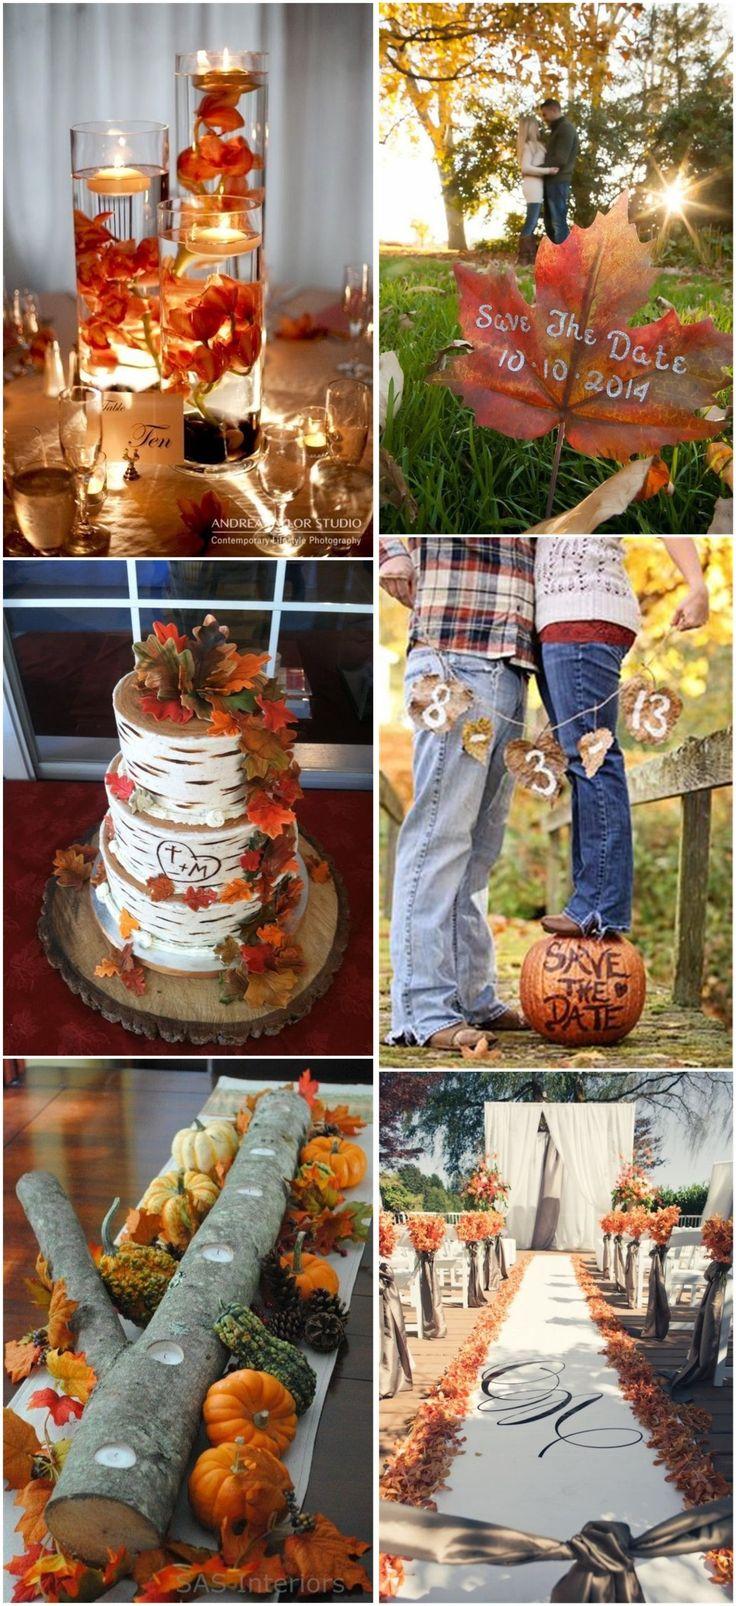 248 best Autumn Wedding Ideas images on Pinterest | Fall home decor ...